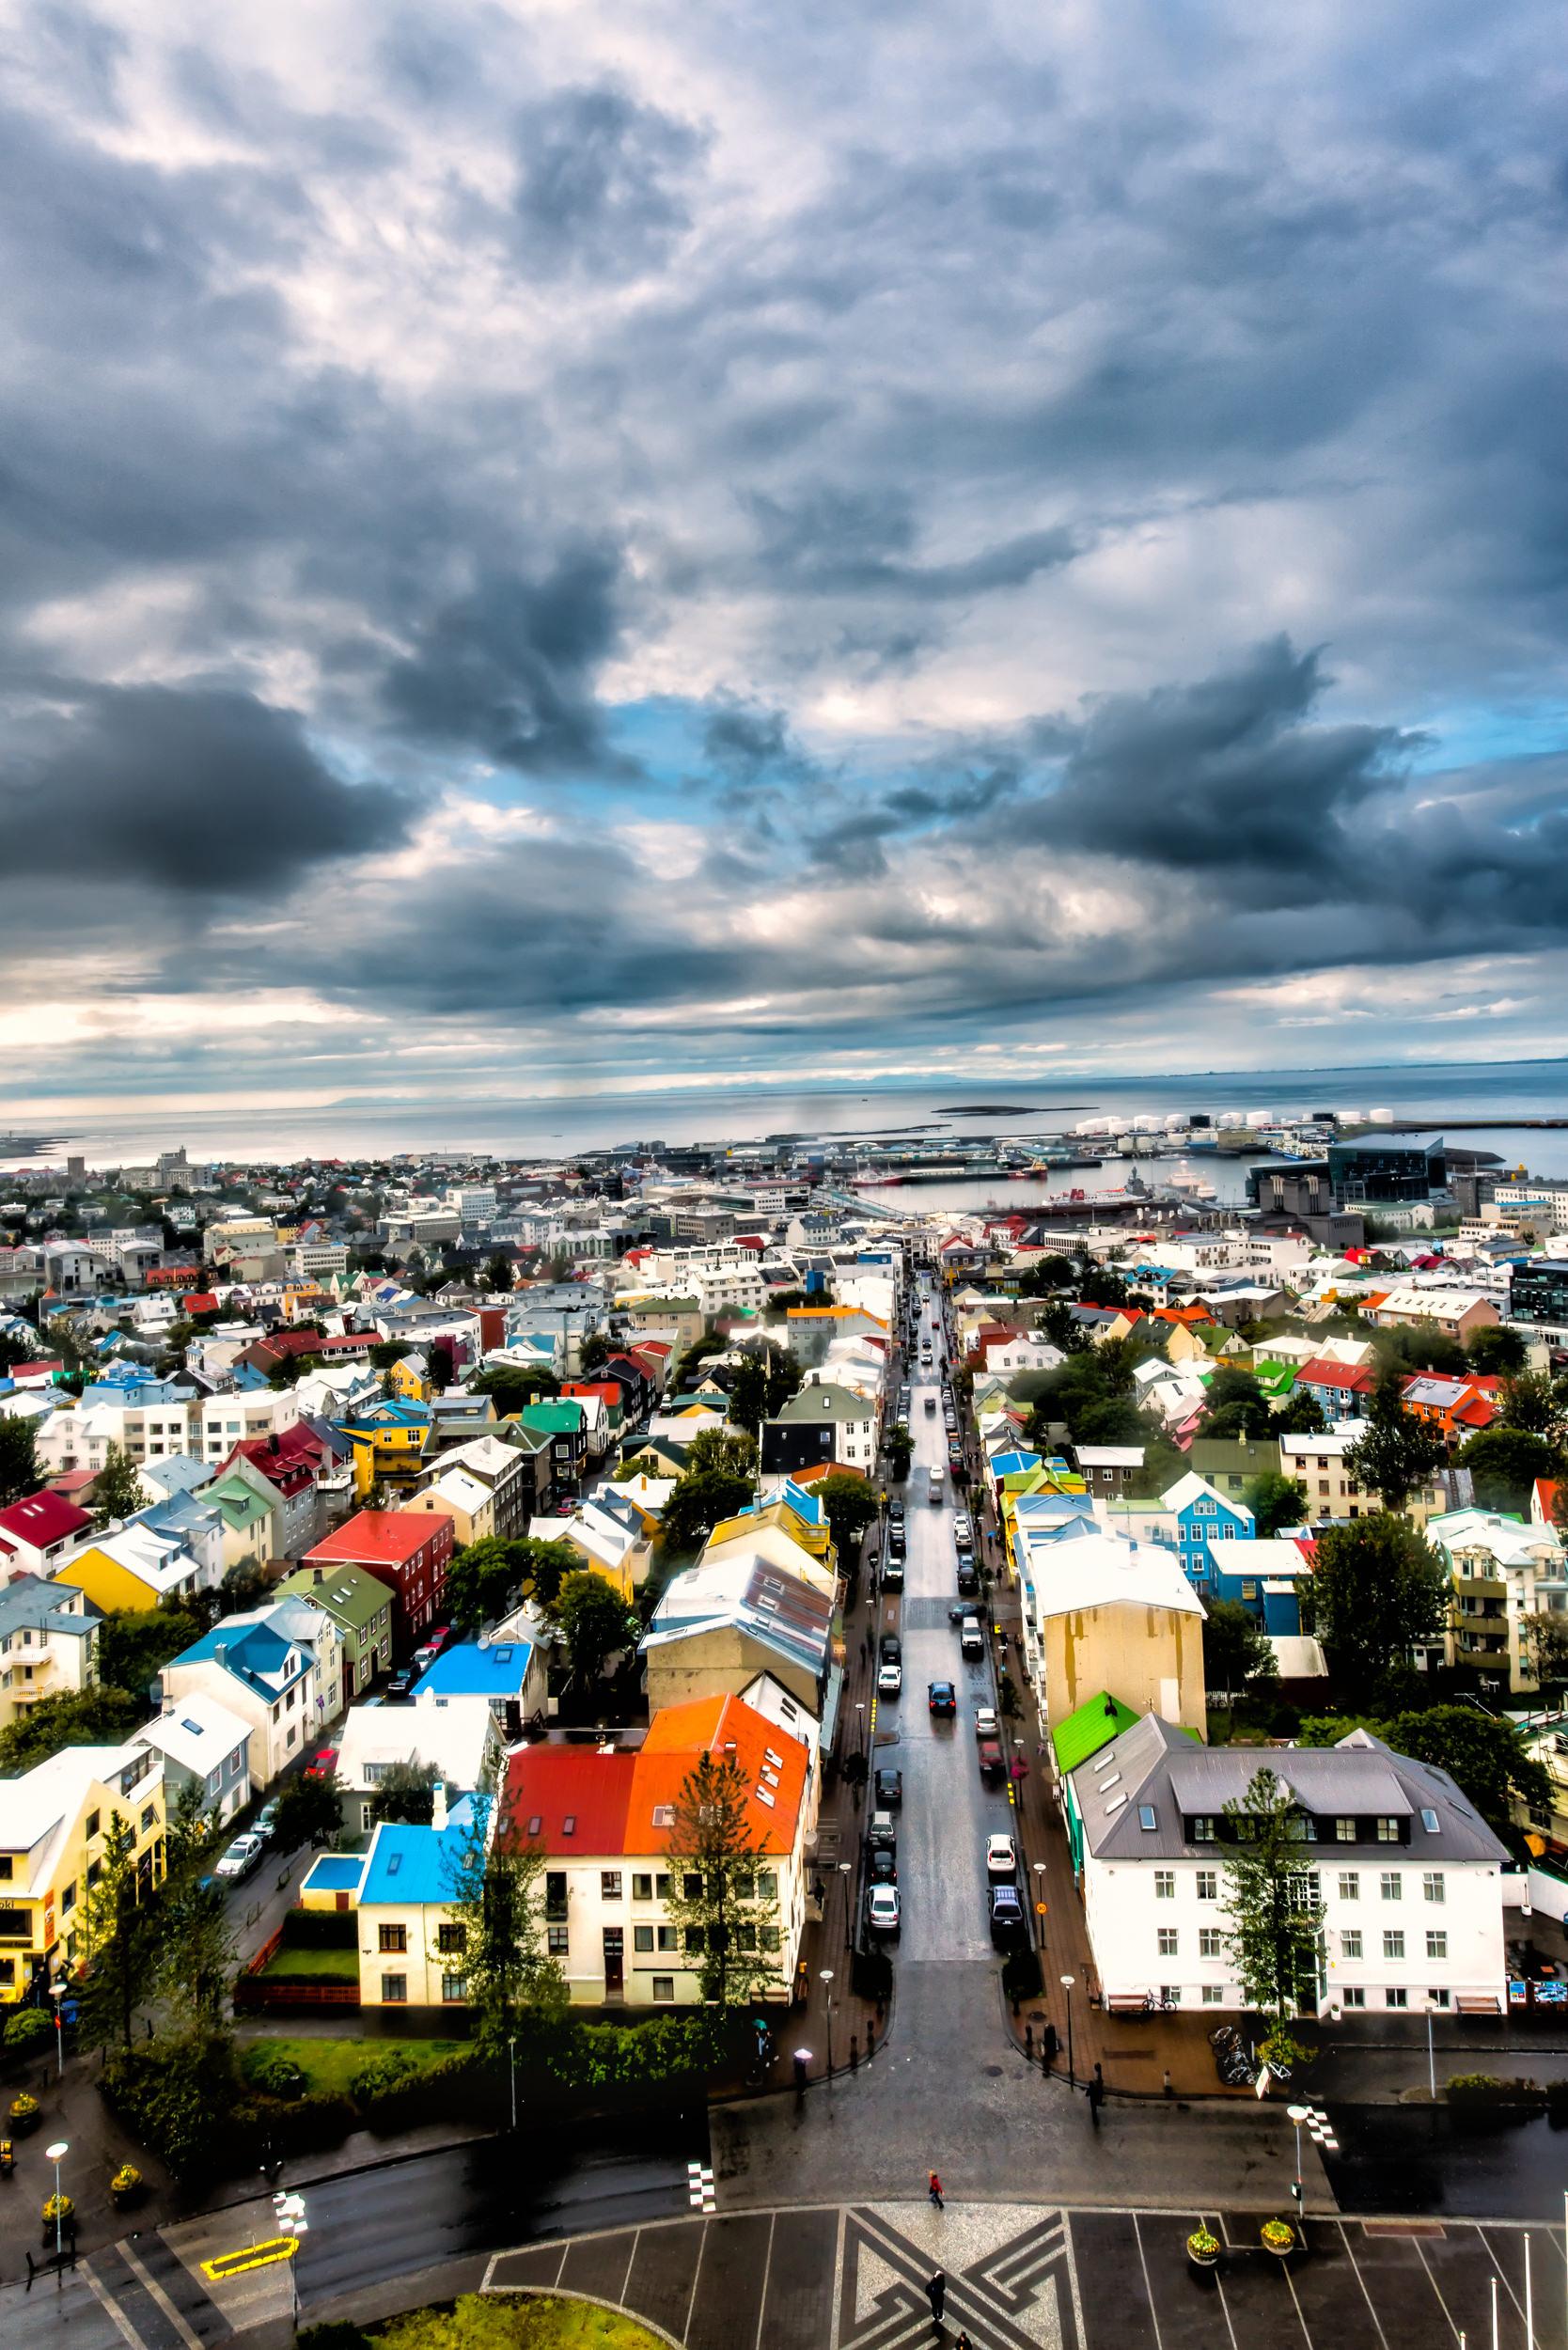 [2012 08 12] Iceland Reykjavik NIKON D800 (7413)-Edit-Edit.jpg